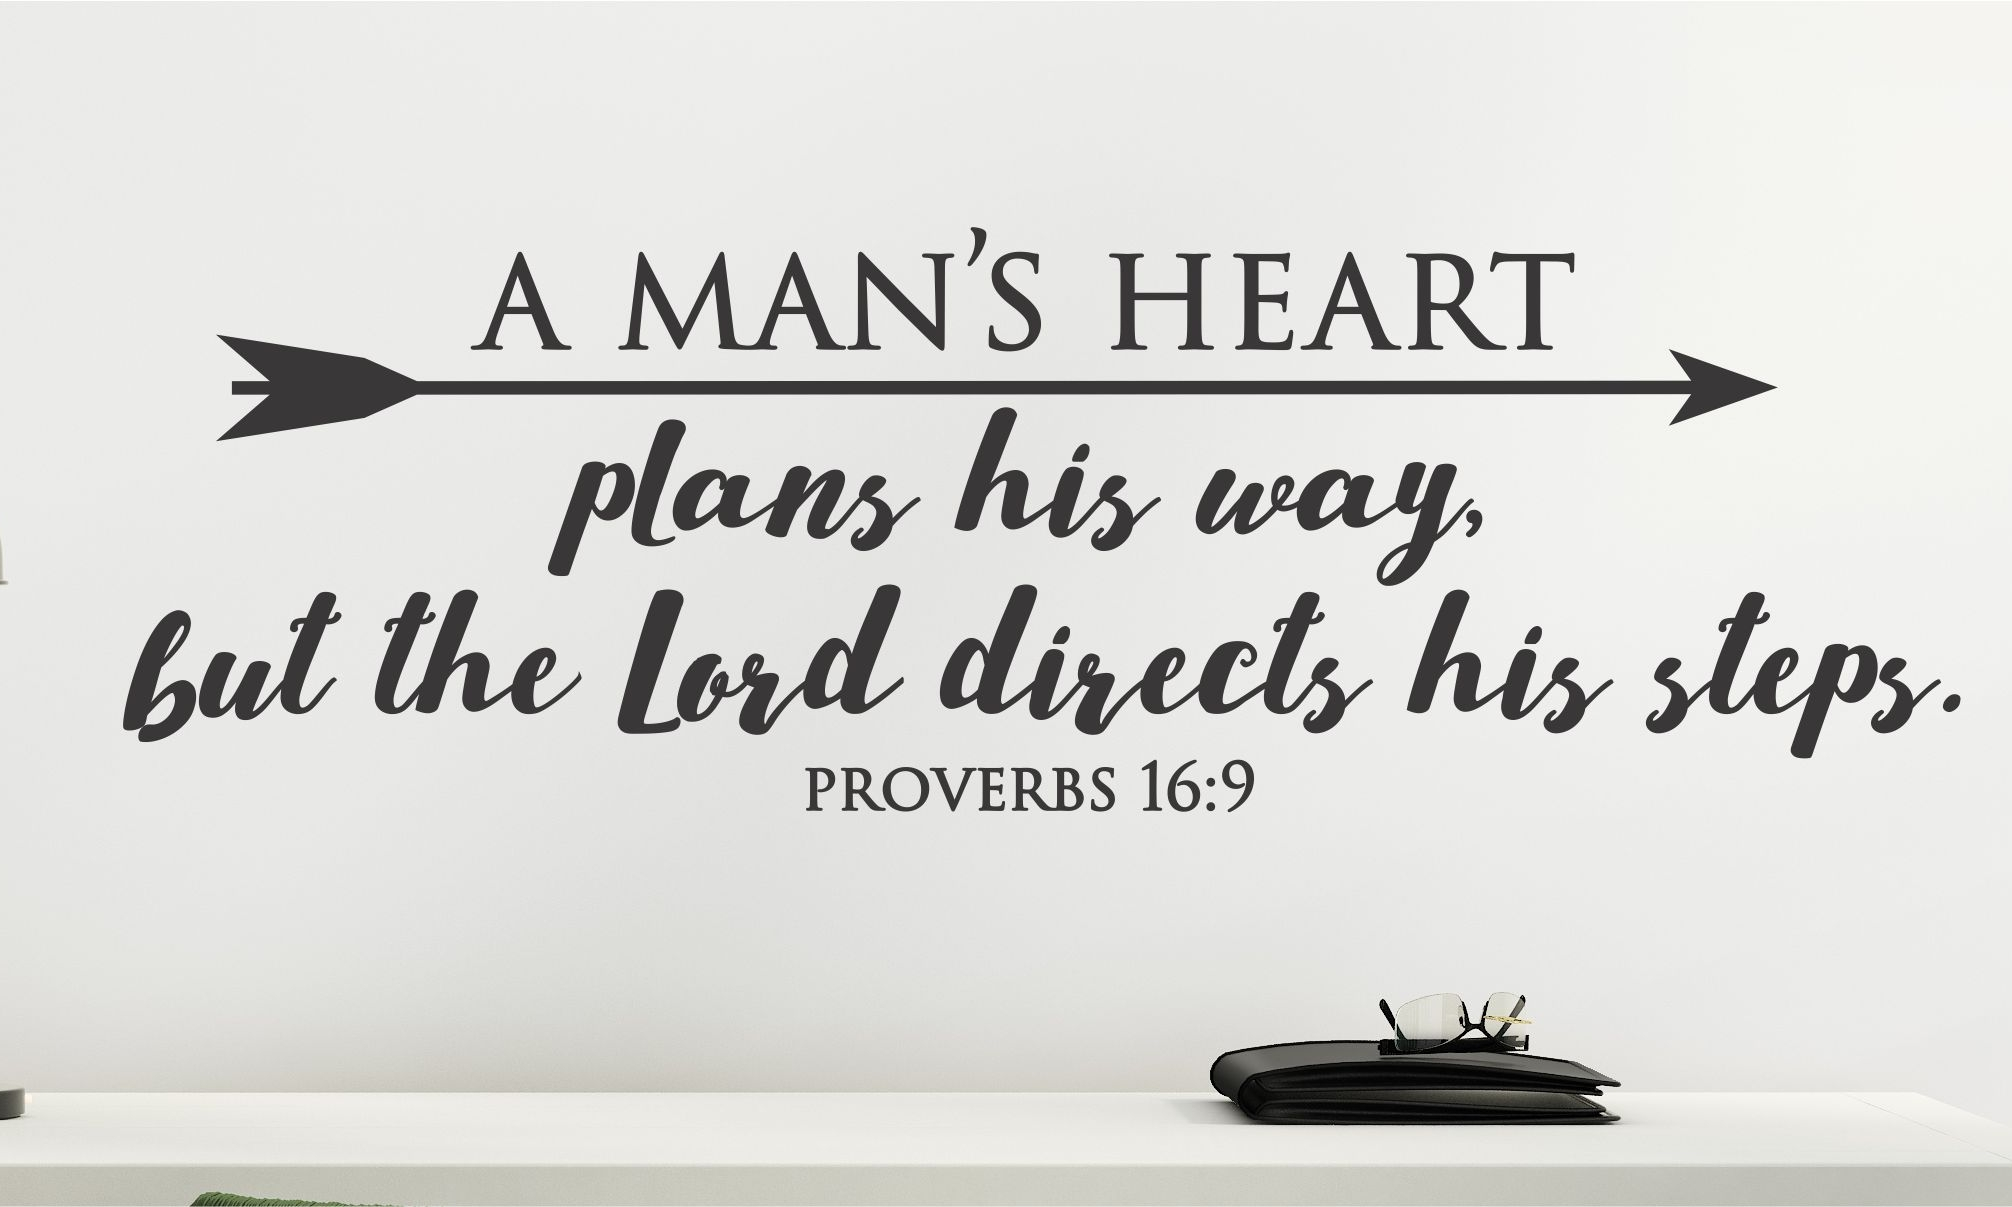 Proverbs-16-9-A-Mans-Heart-close-up.jpg